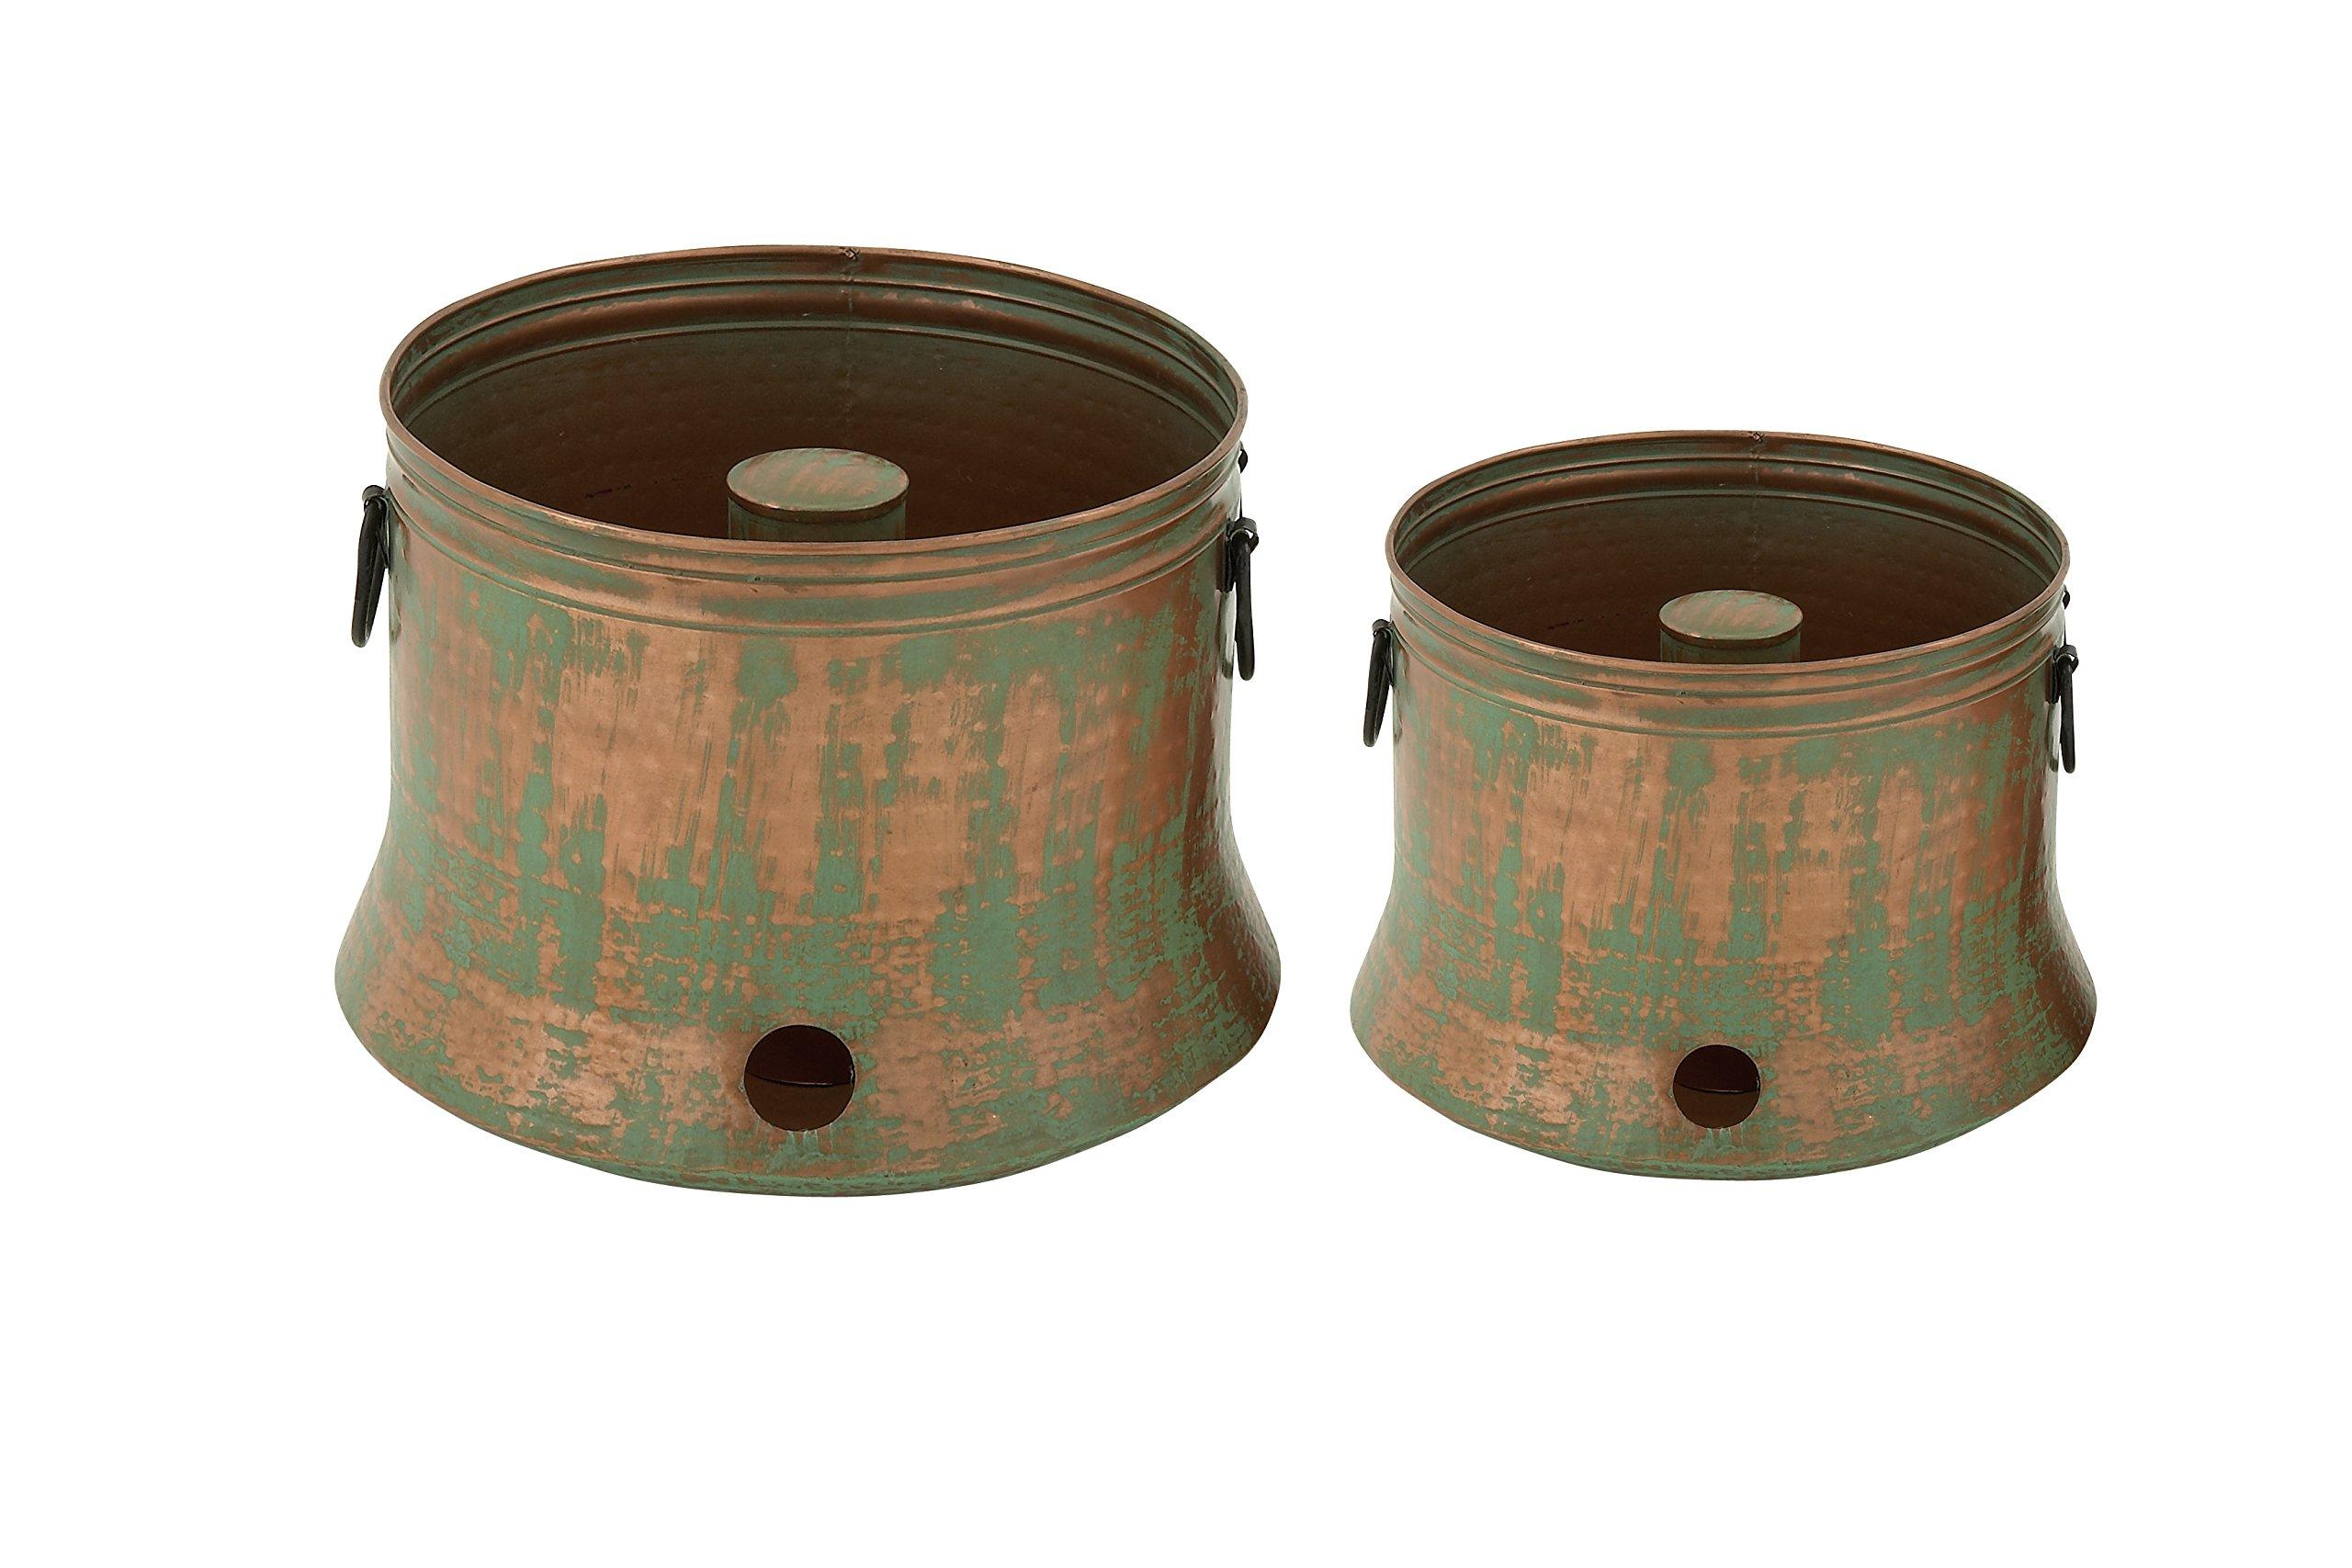 Deco 79 Metal Rustic Iron Hose Holder (Set of 2), 15''/20''H